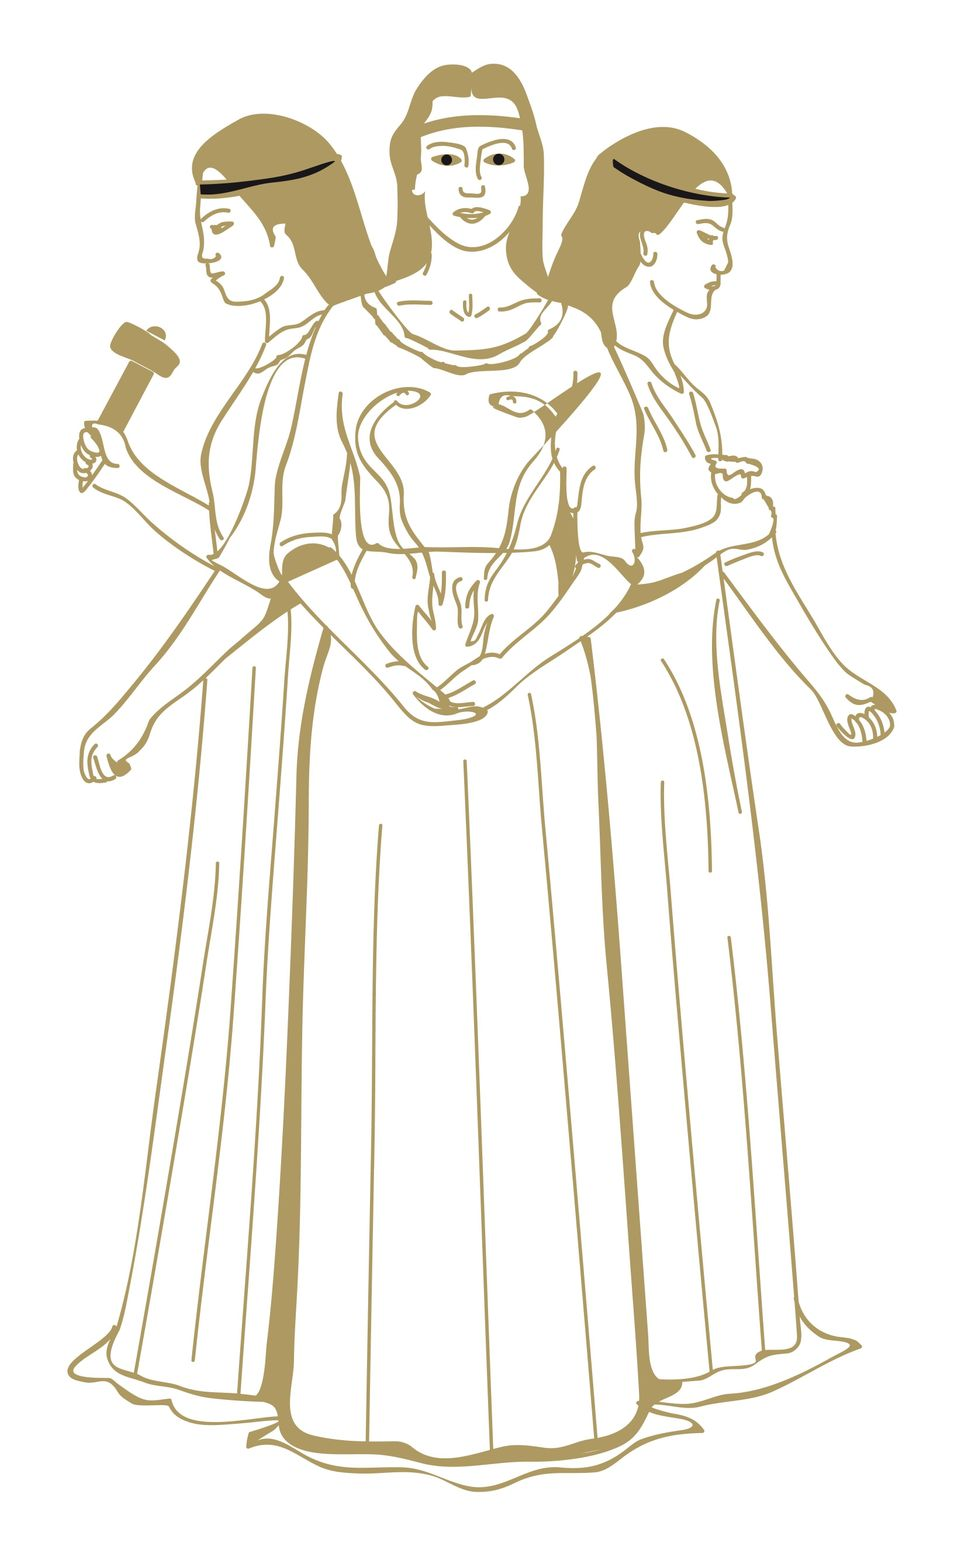 "Brigid is a <a href=""http://www.maryjones.us/jce/brigit.html"" target=""_blank"">Celtic goddess</a> revered for her many talents"